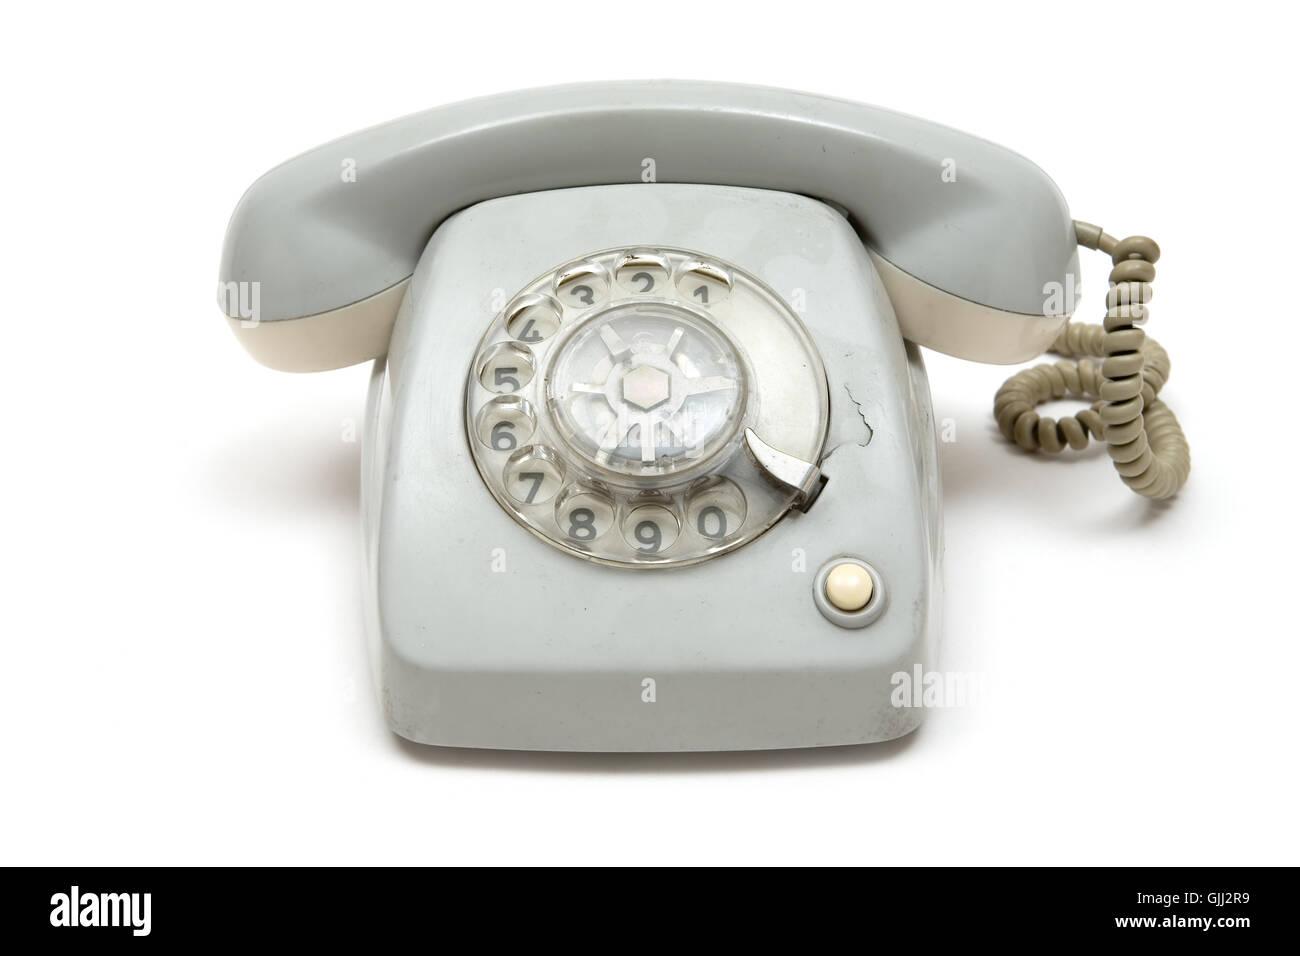 analog phone - Stock Image